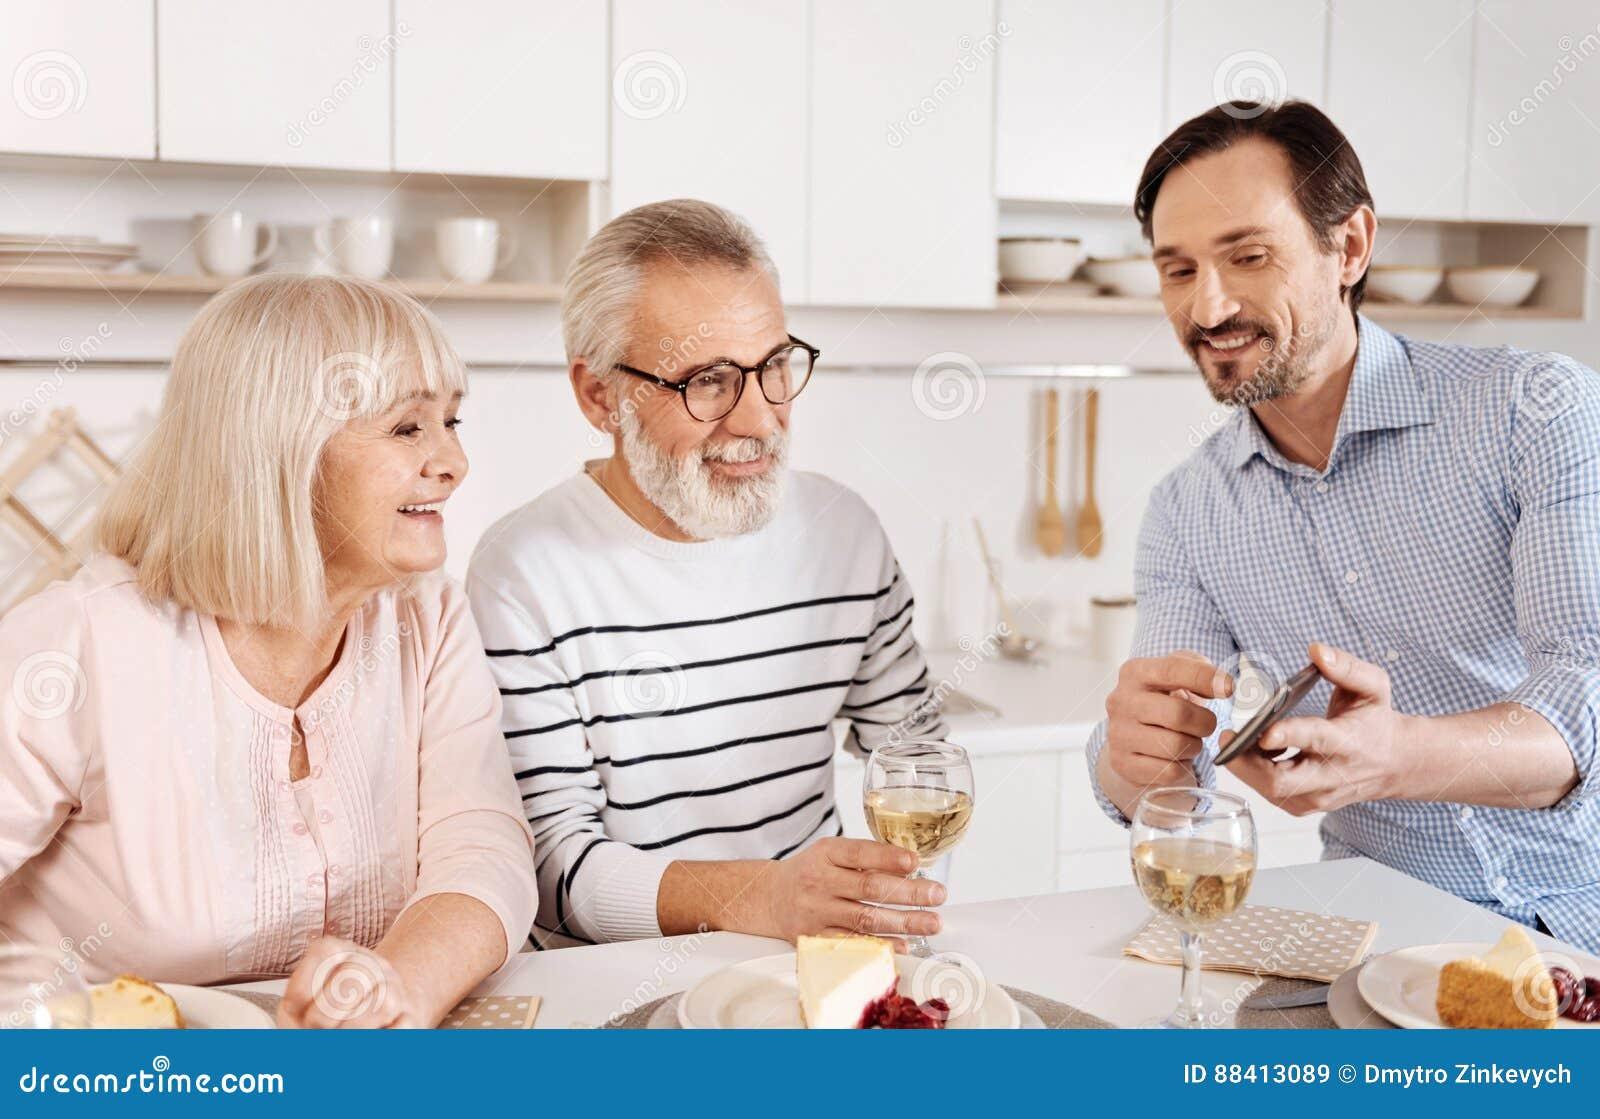 Amused mature man enjoying family weekend at home